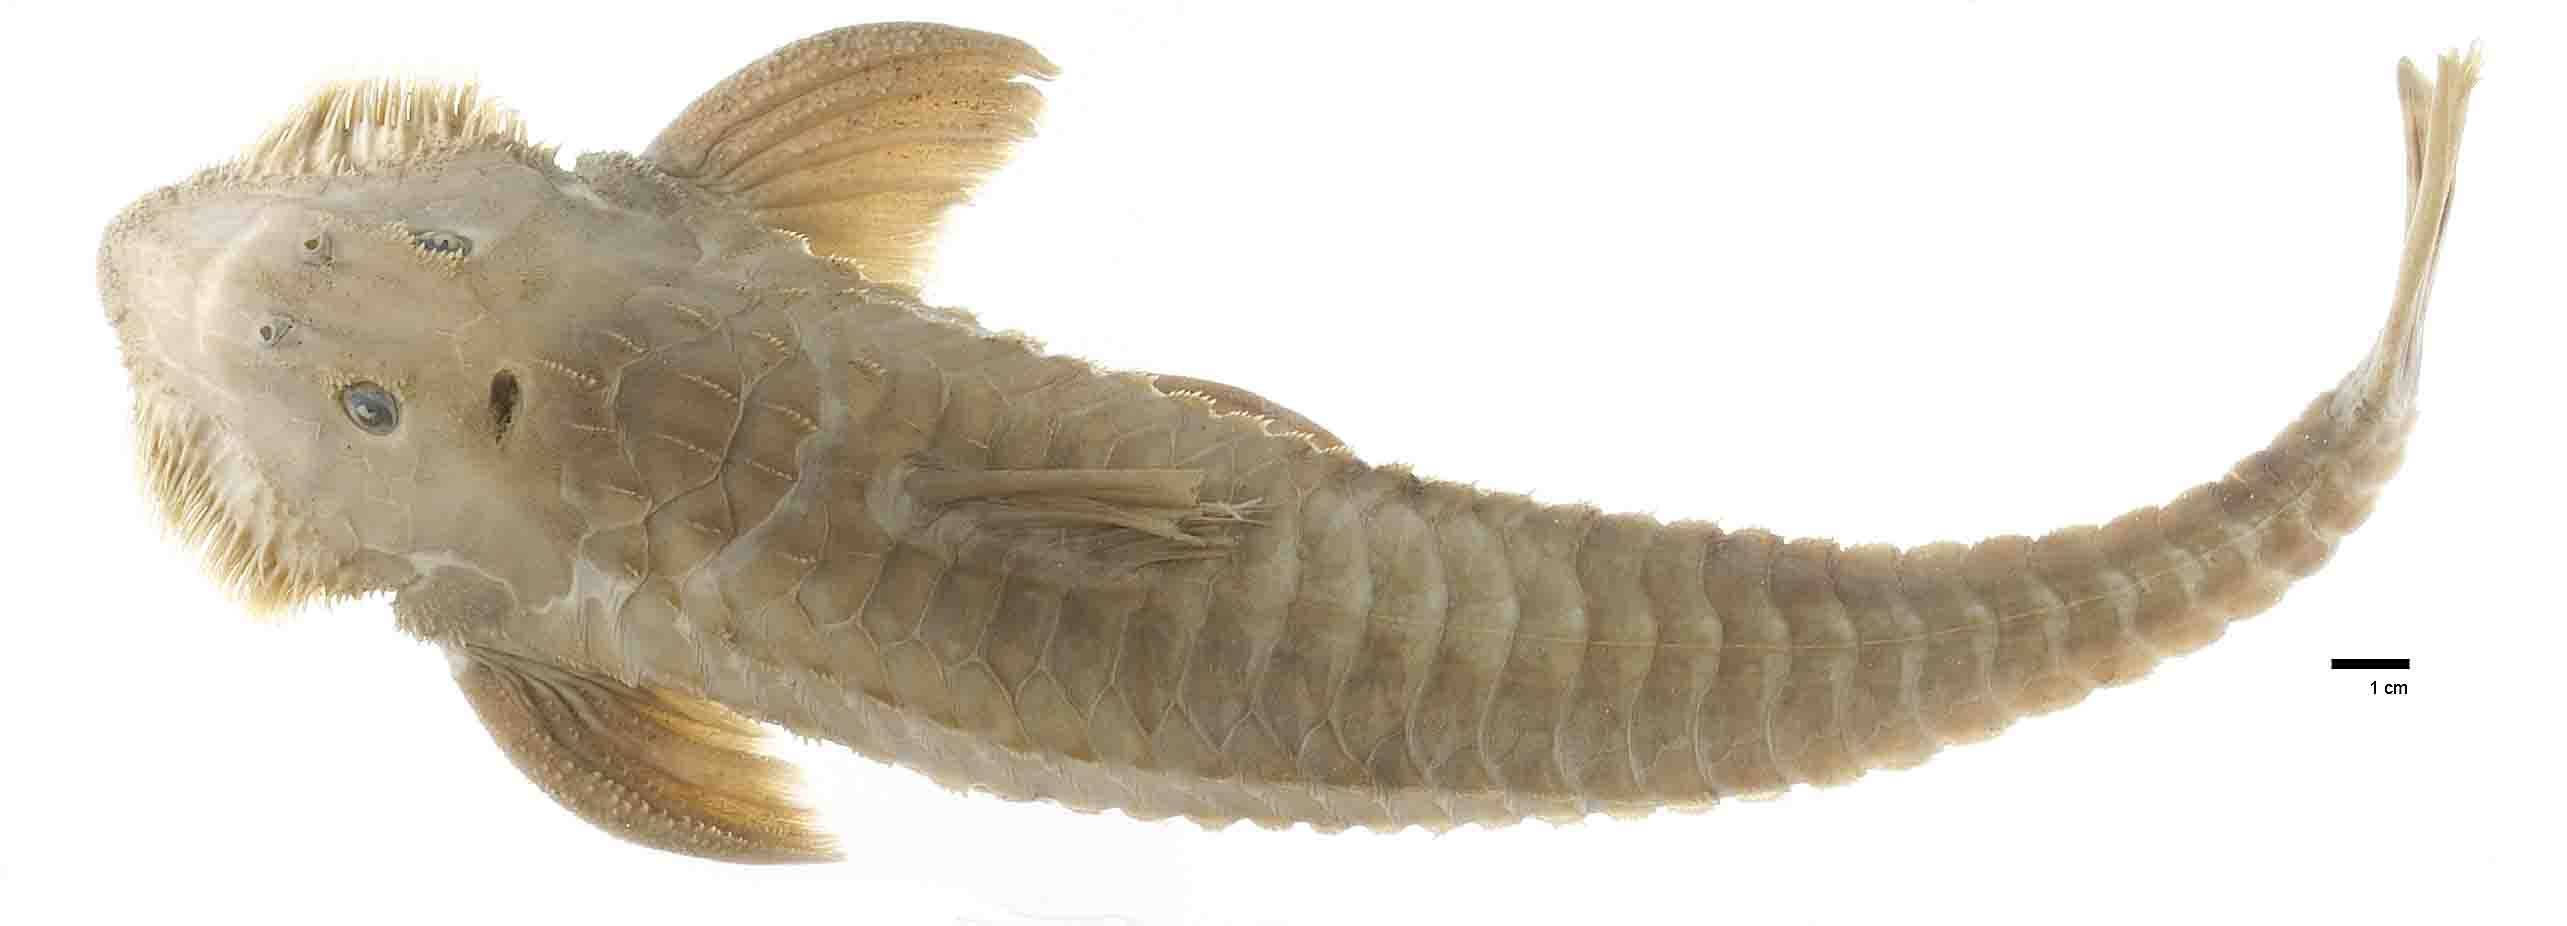 Image of loricariid catfish